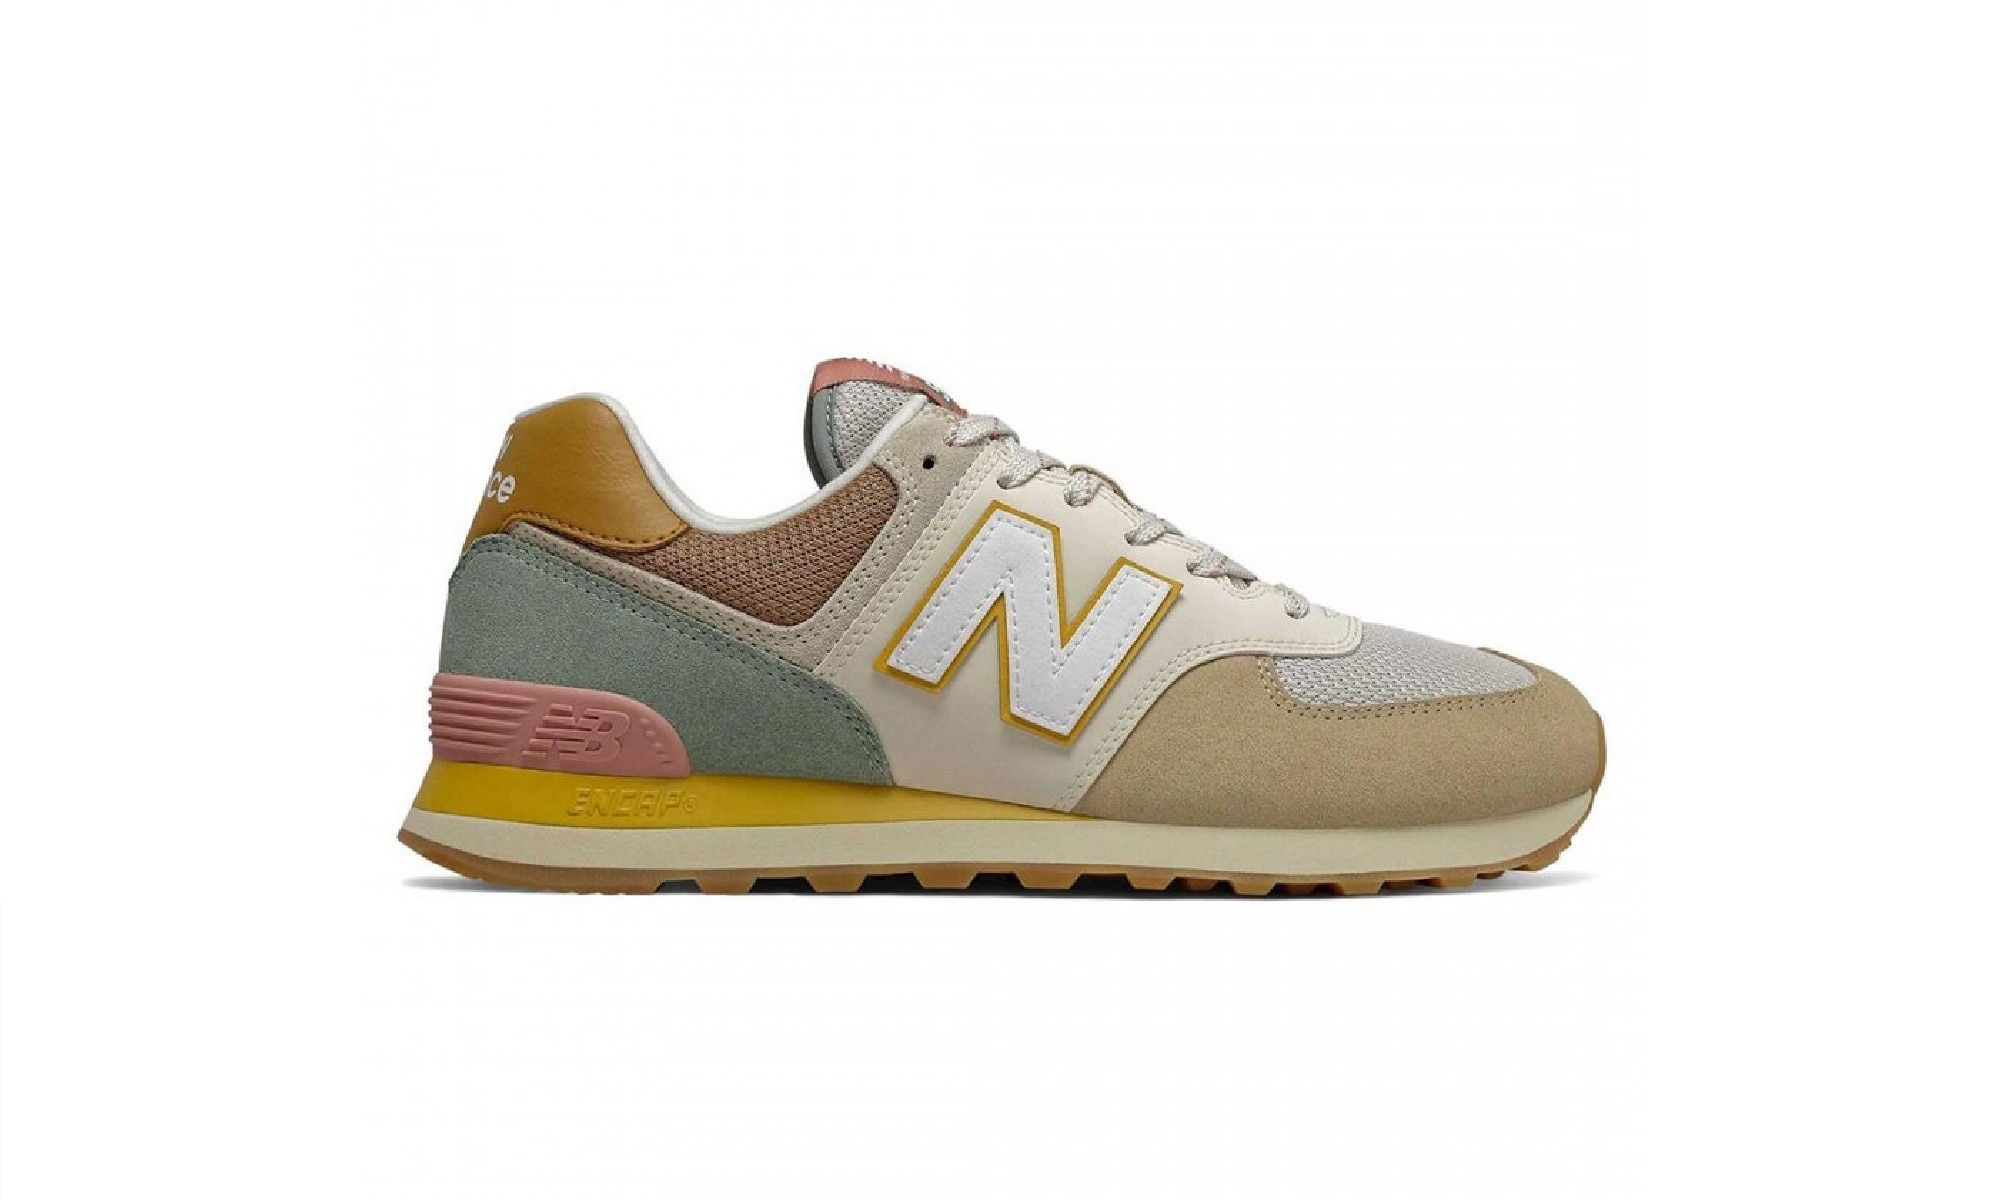 New Balance Drops 574 Sneaker in Brown